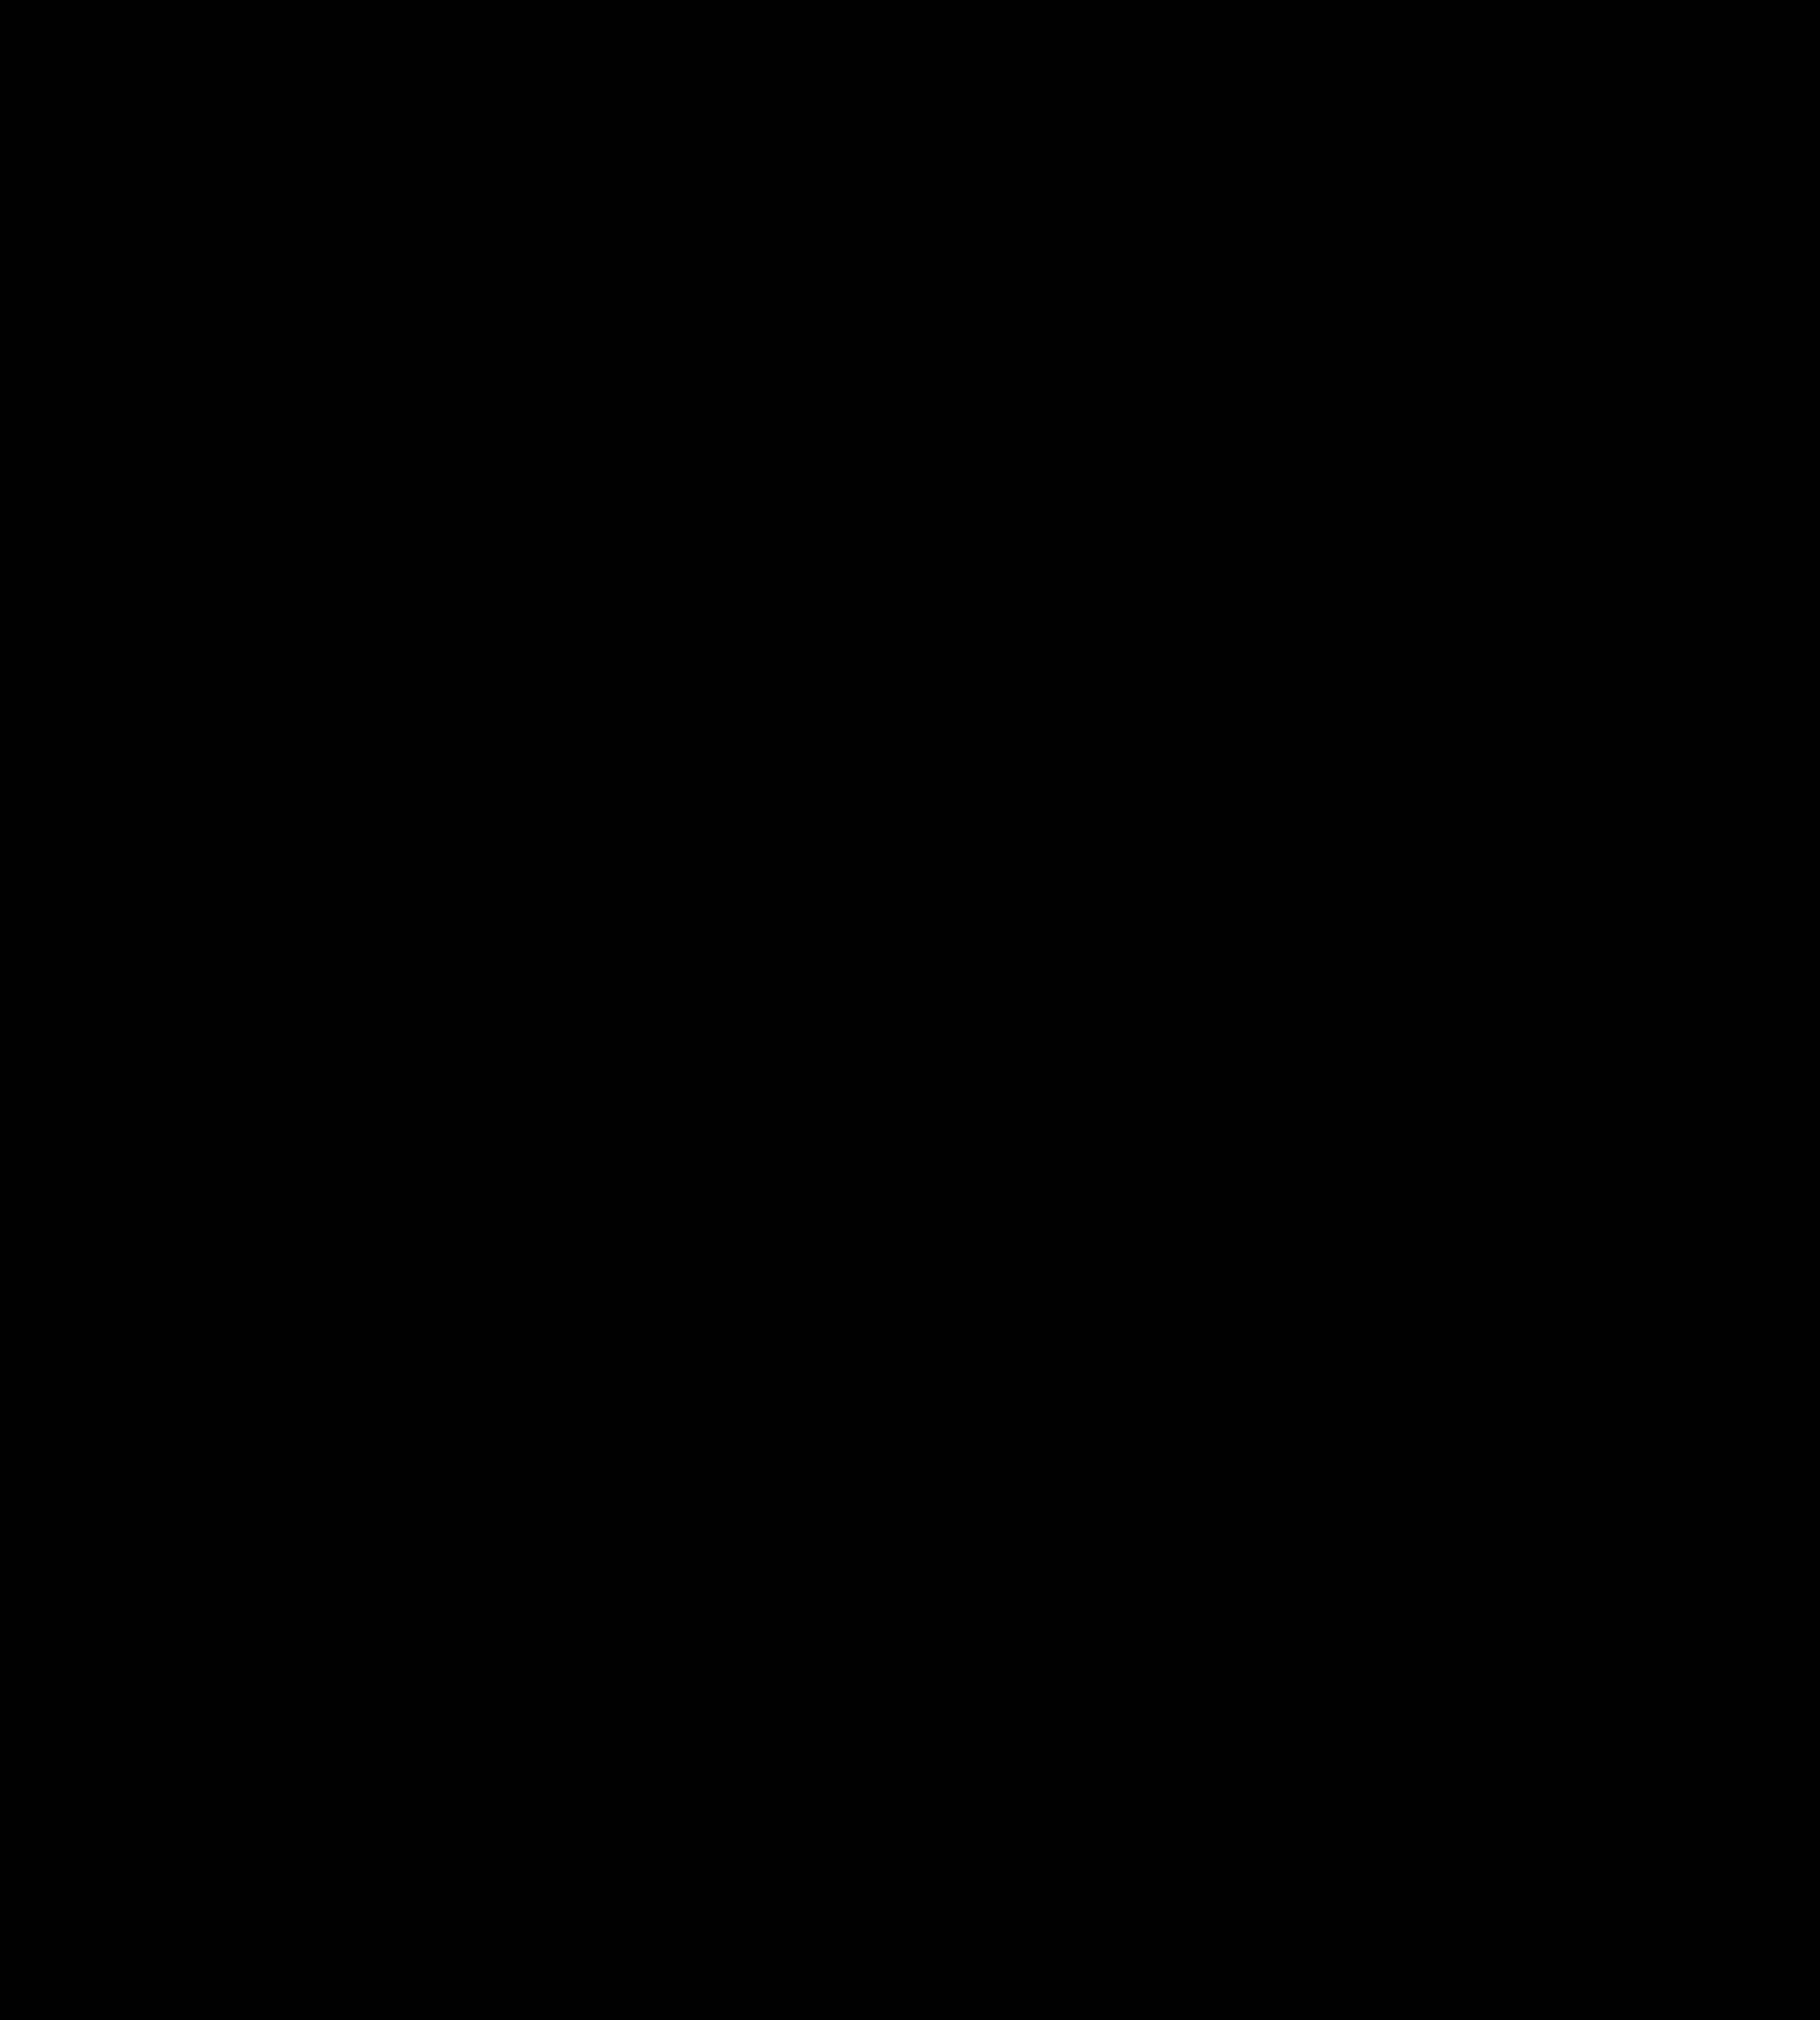 4-Davolls-Logos-7.15.16-02.png